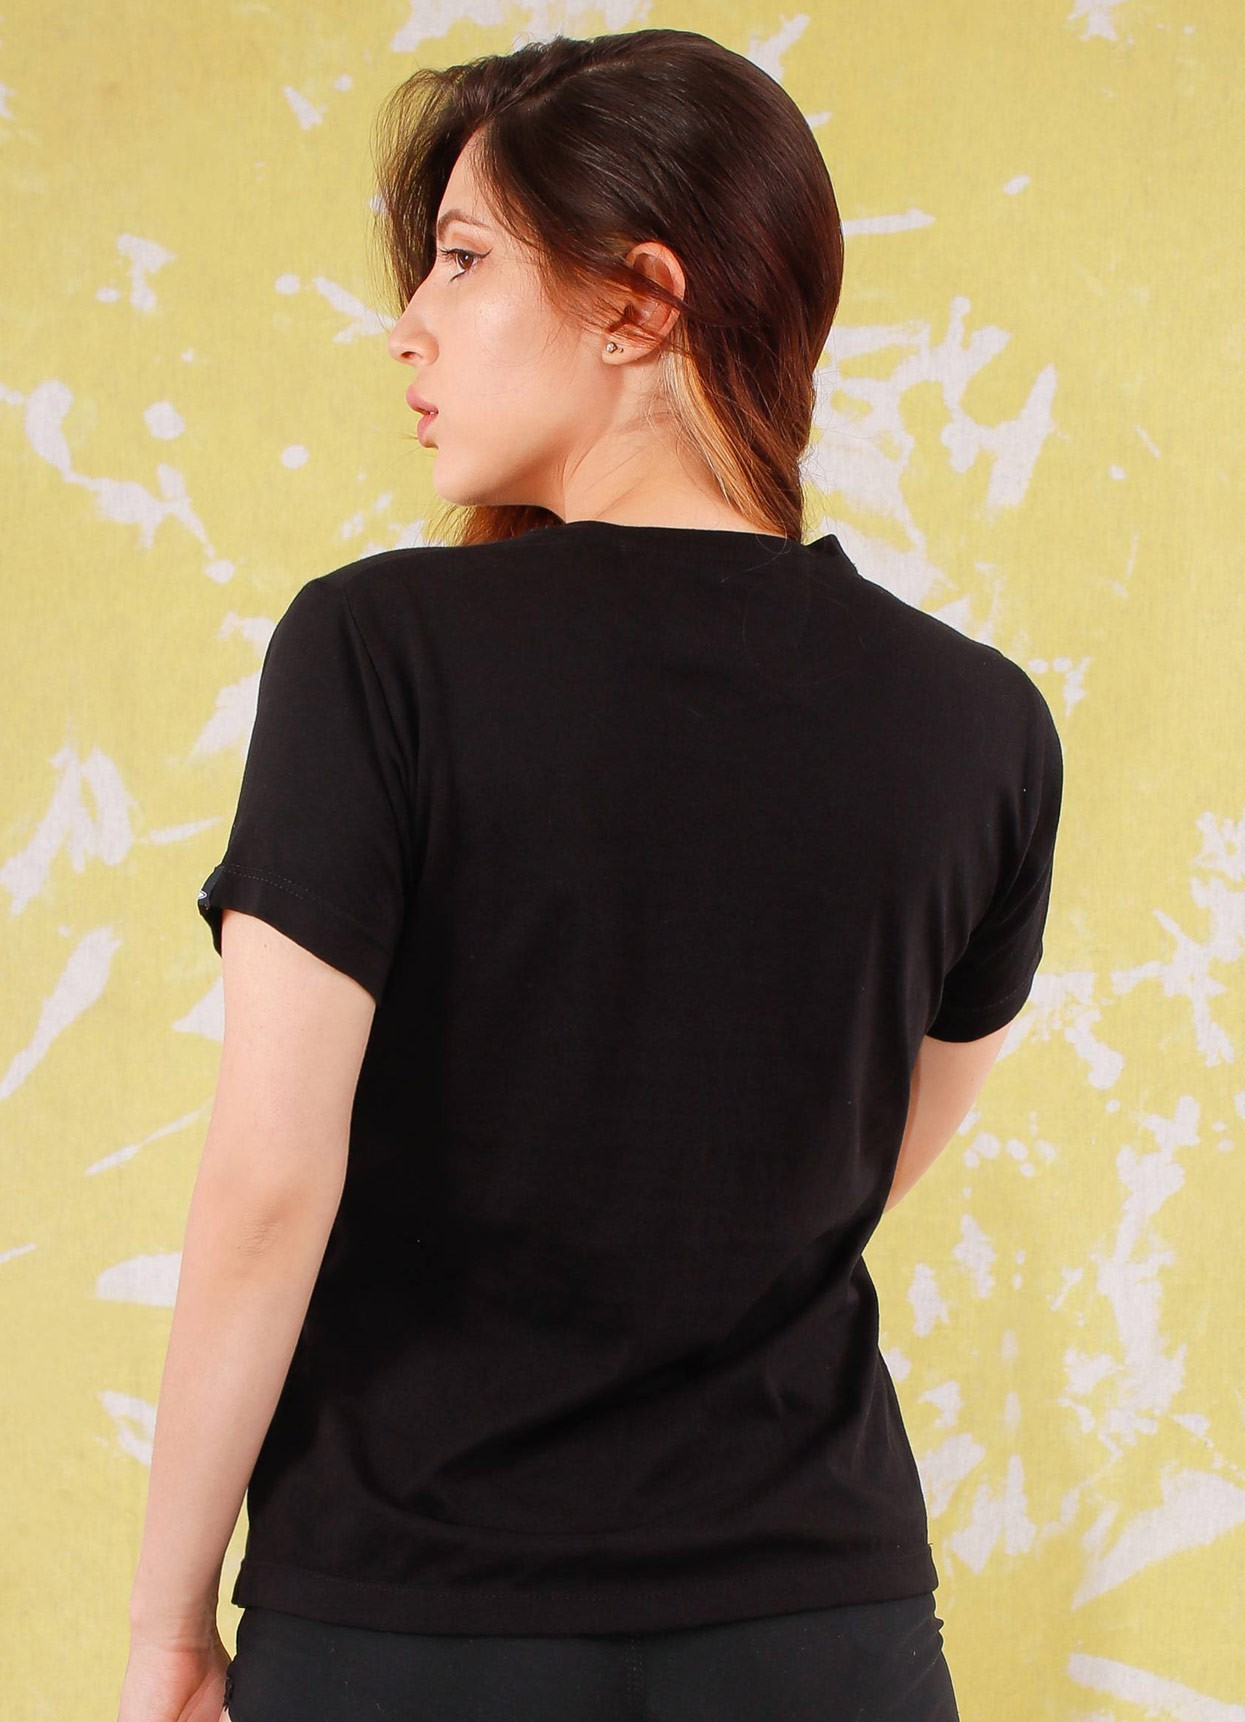 Camiseta de mujer básica Ovni Negra.